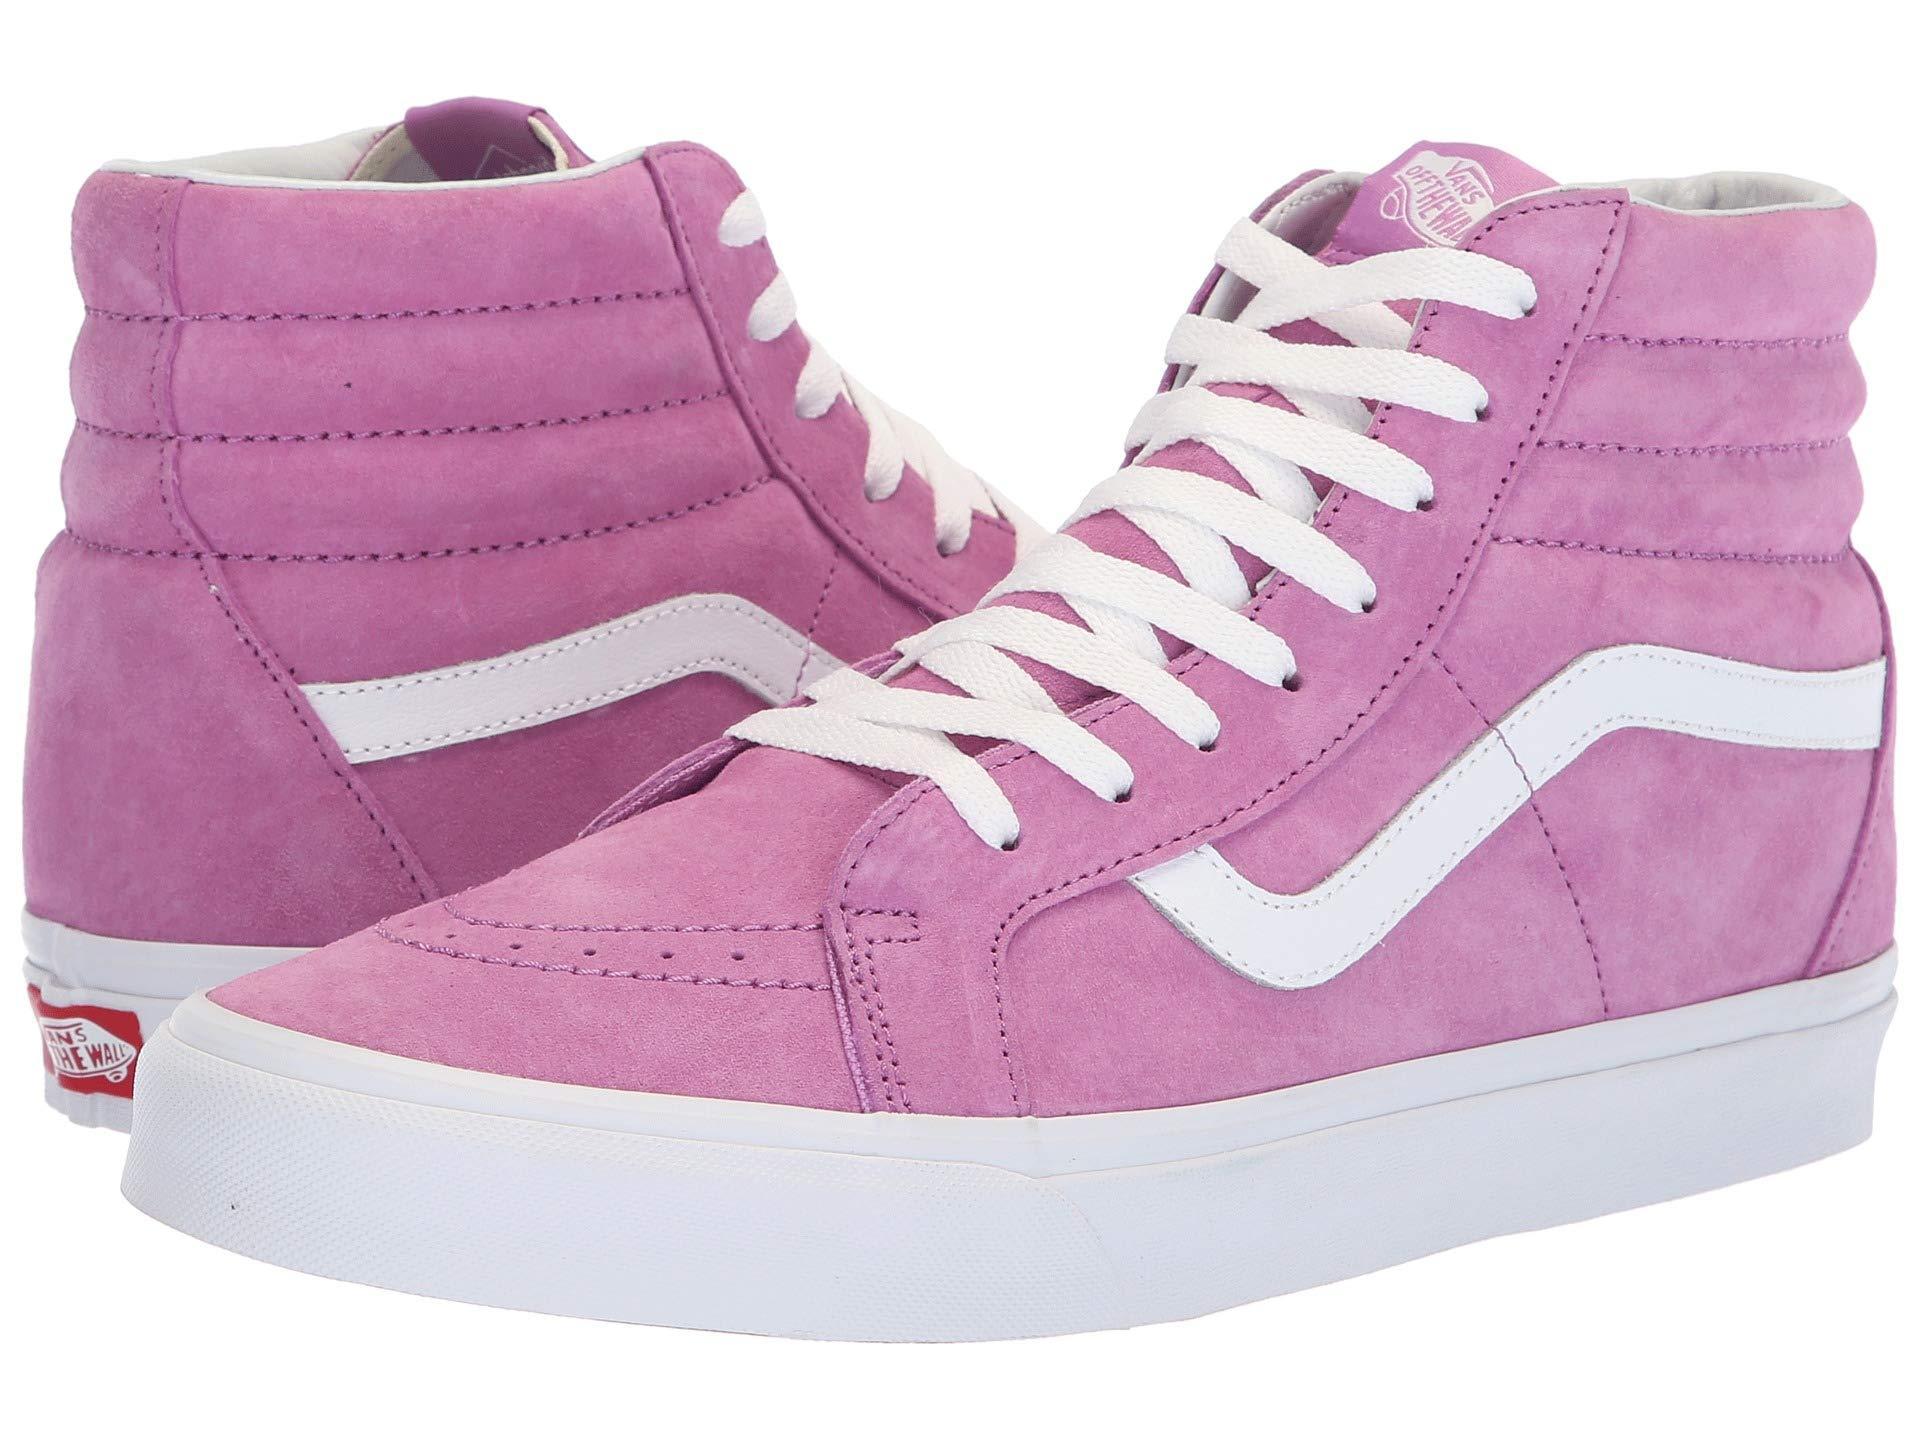 5c170aa2ca Vans. Women s Sk8-hi Reissue ((pig Suede) Violet true White) Skate Shoes